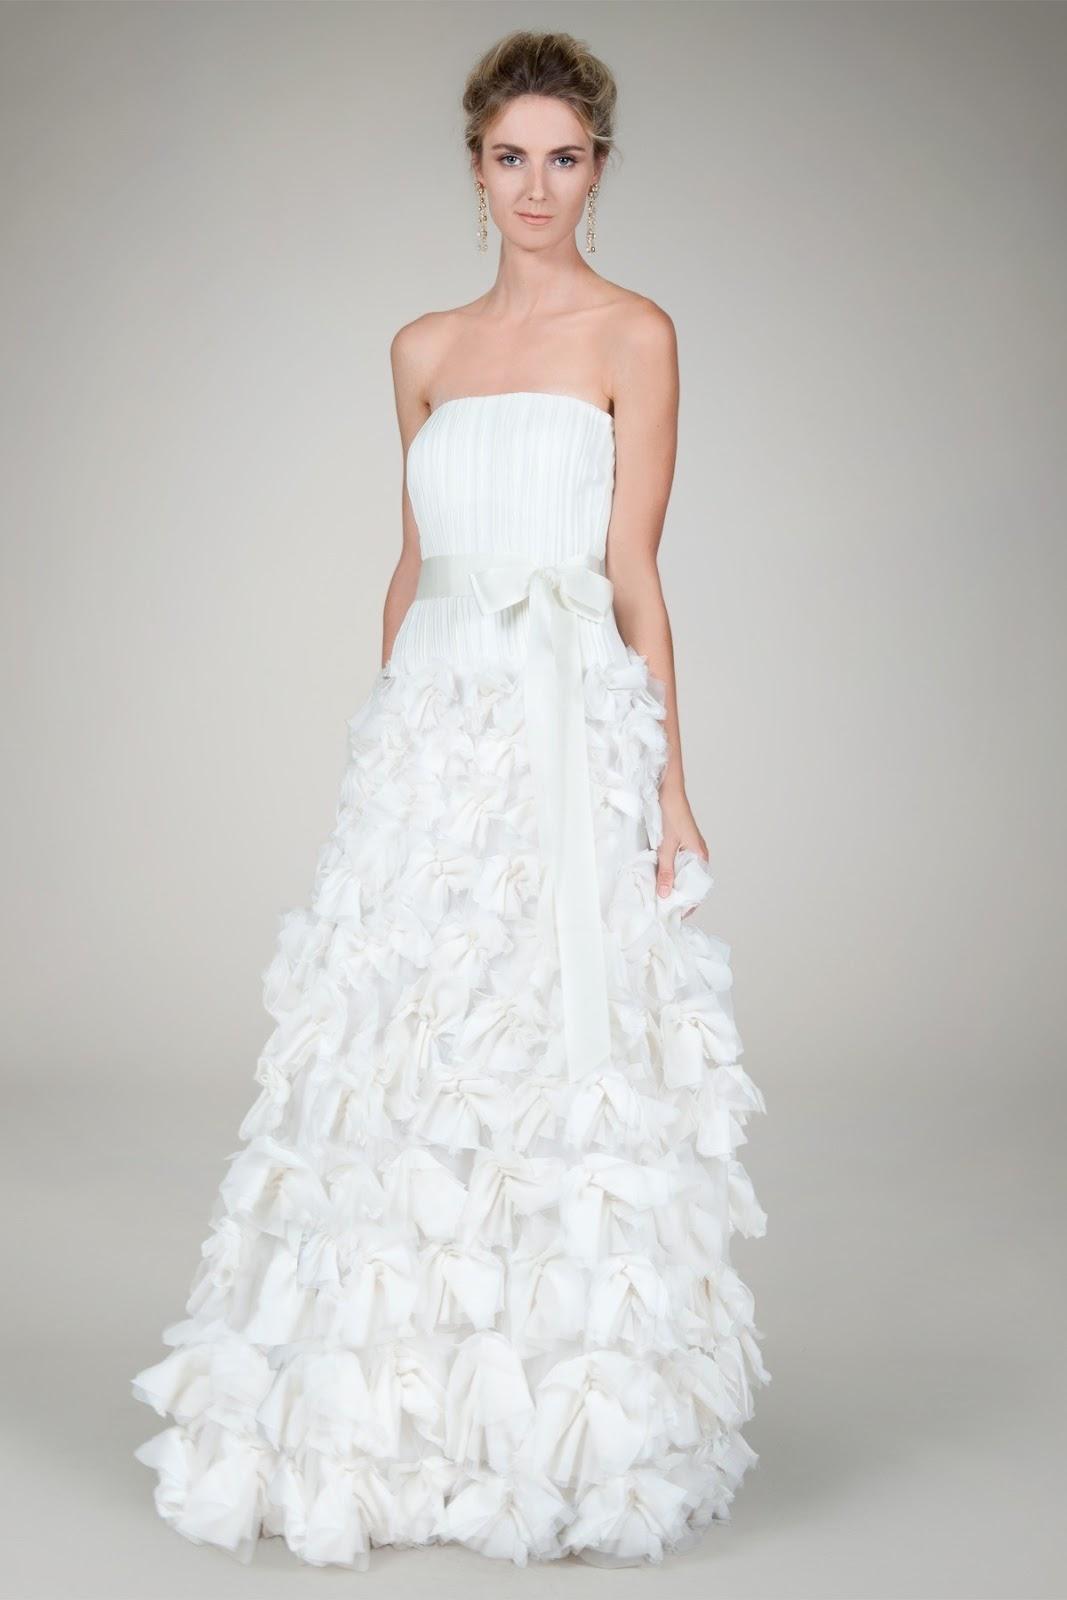 2013 tadashi shoji wedding dresses With tadashi wedding dresses